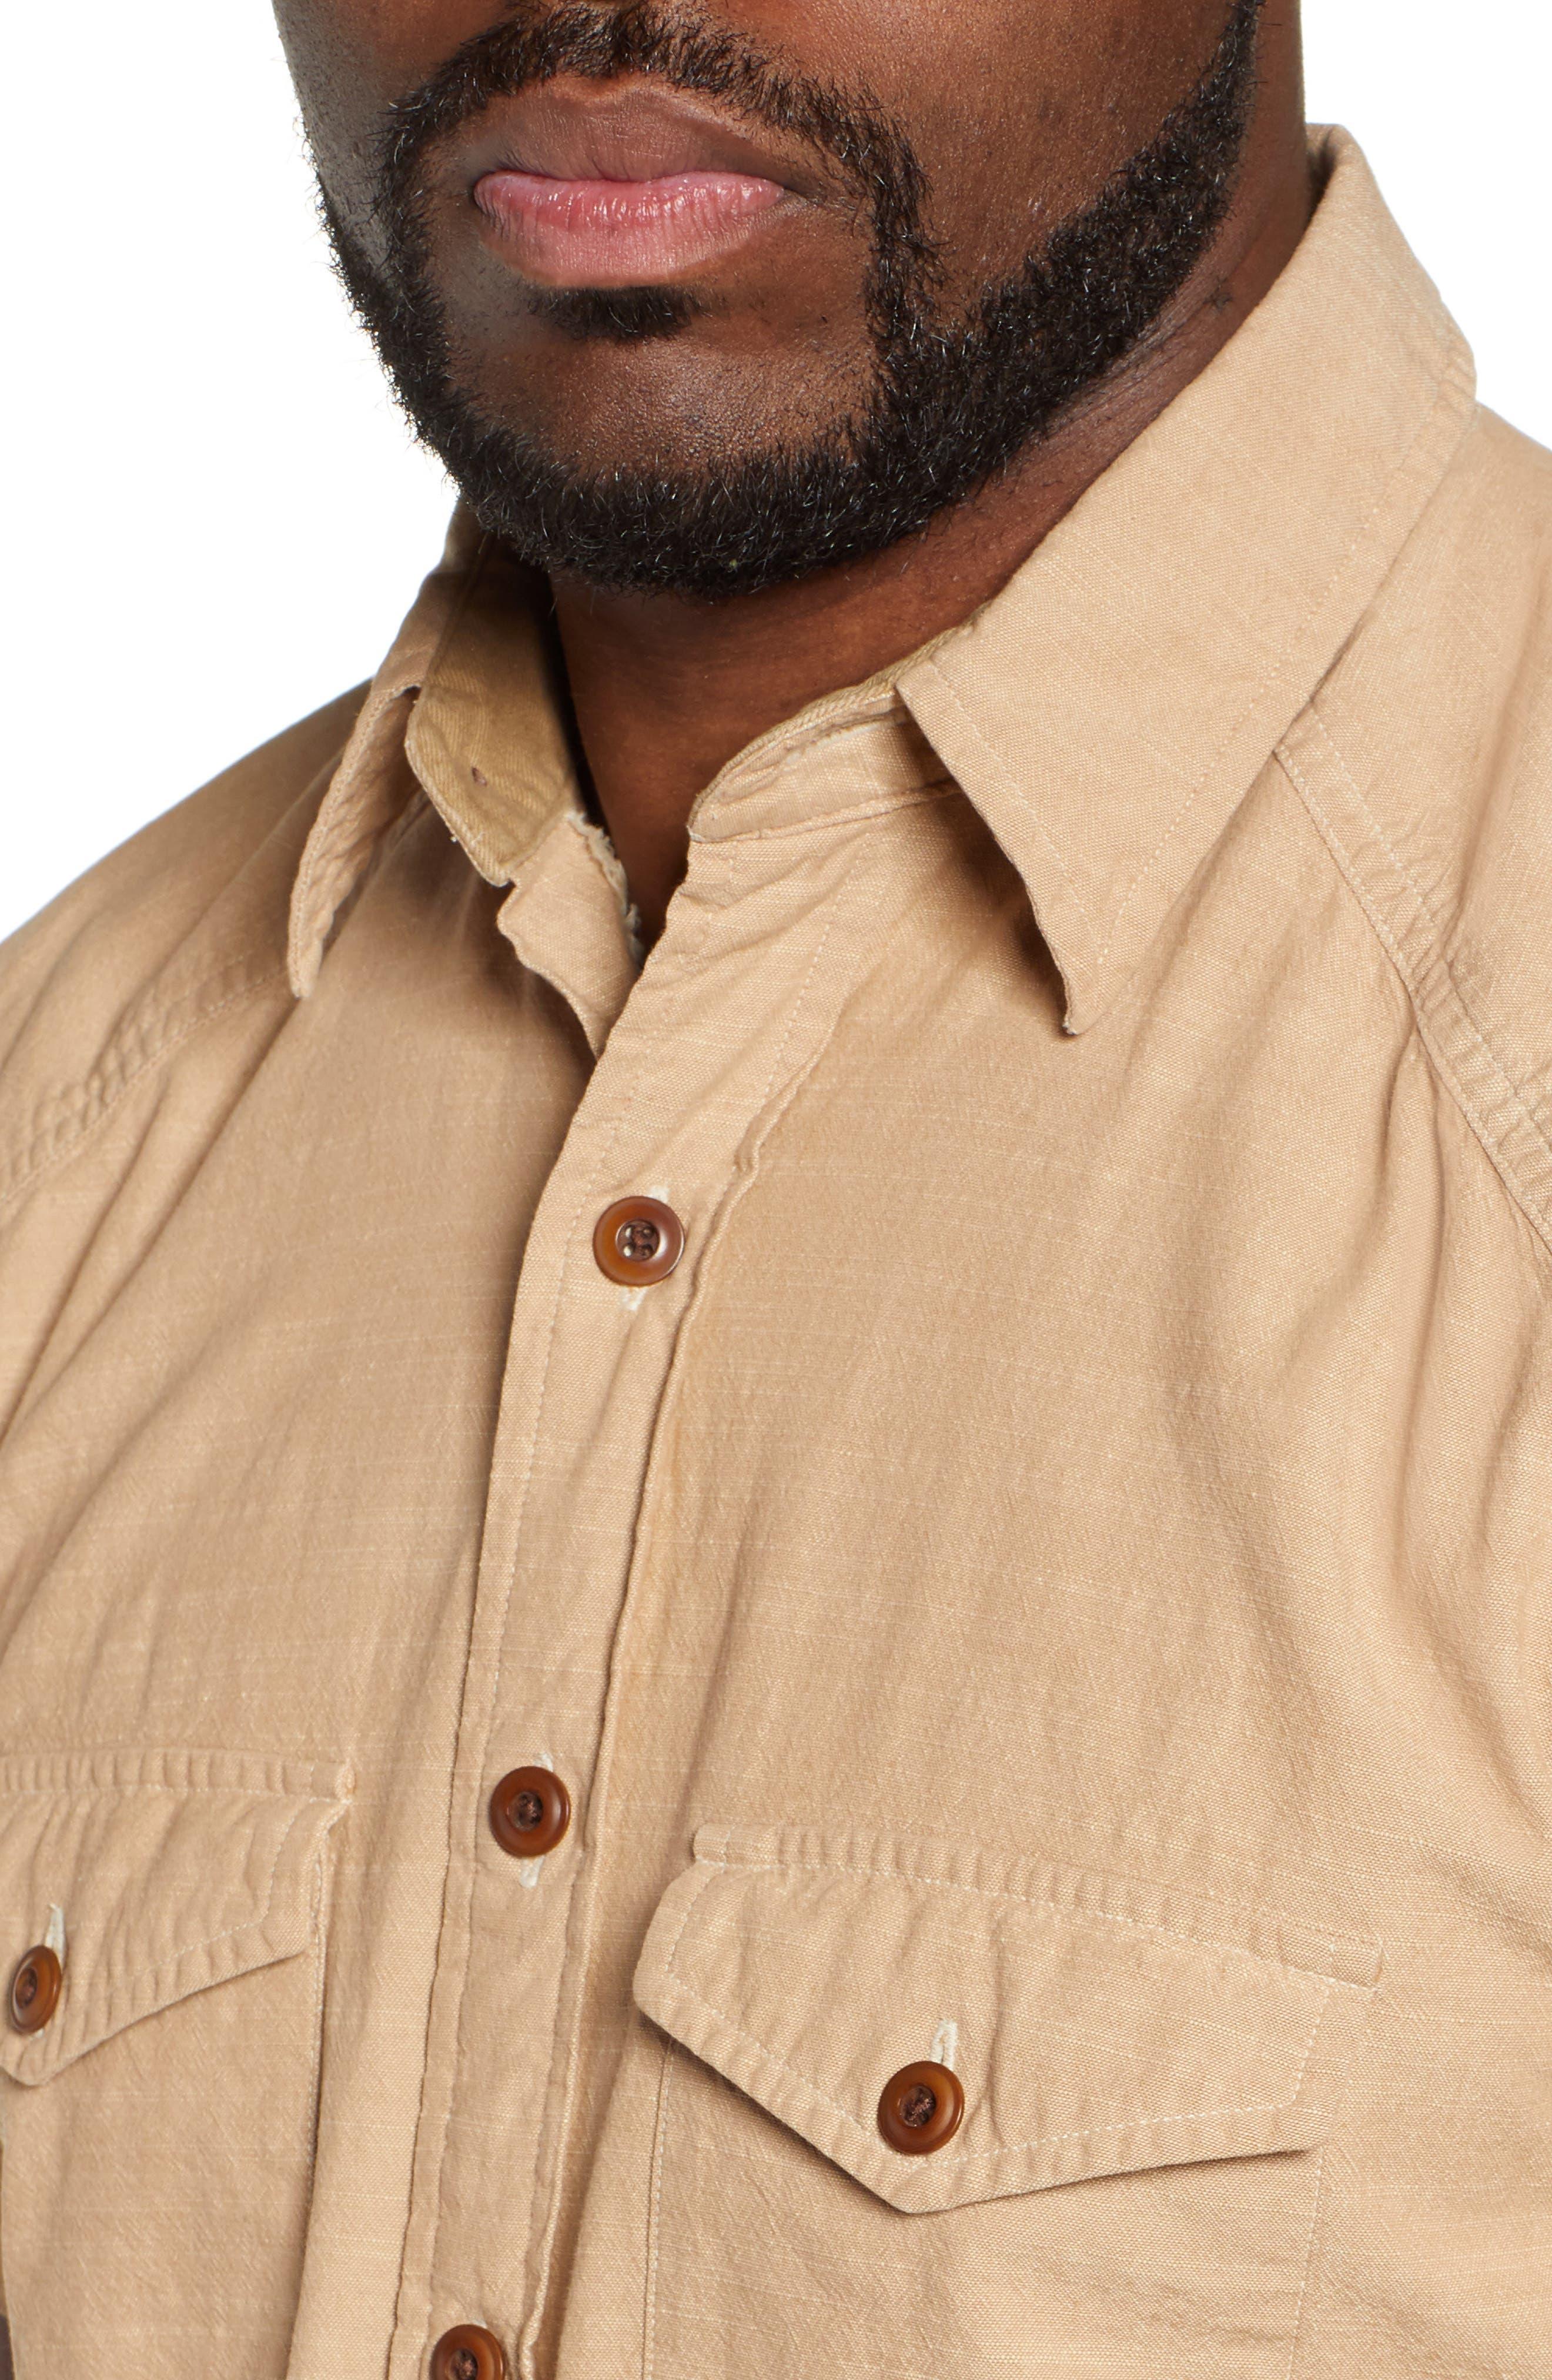 FRYE,                             Addison Chambray Woven Shirt,                             Alternate thumbnail 2, color,                             KRAFT BROWN